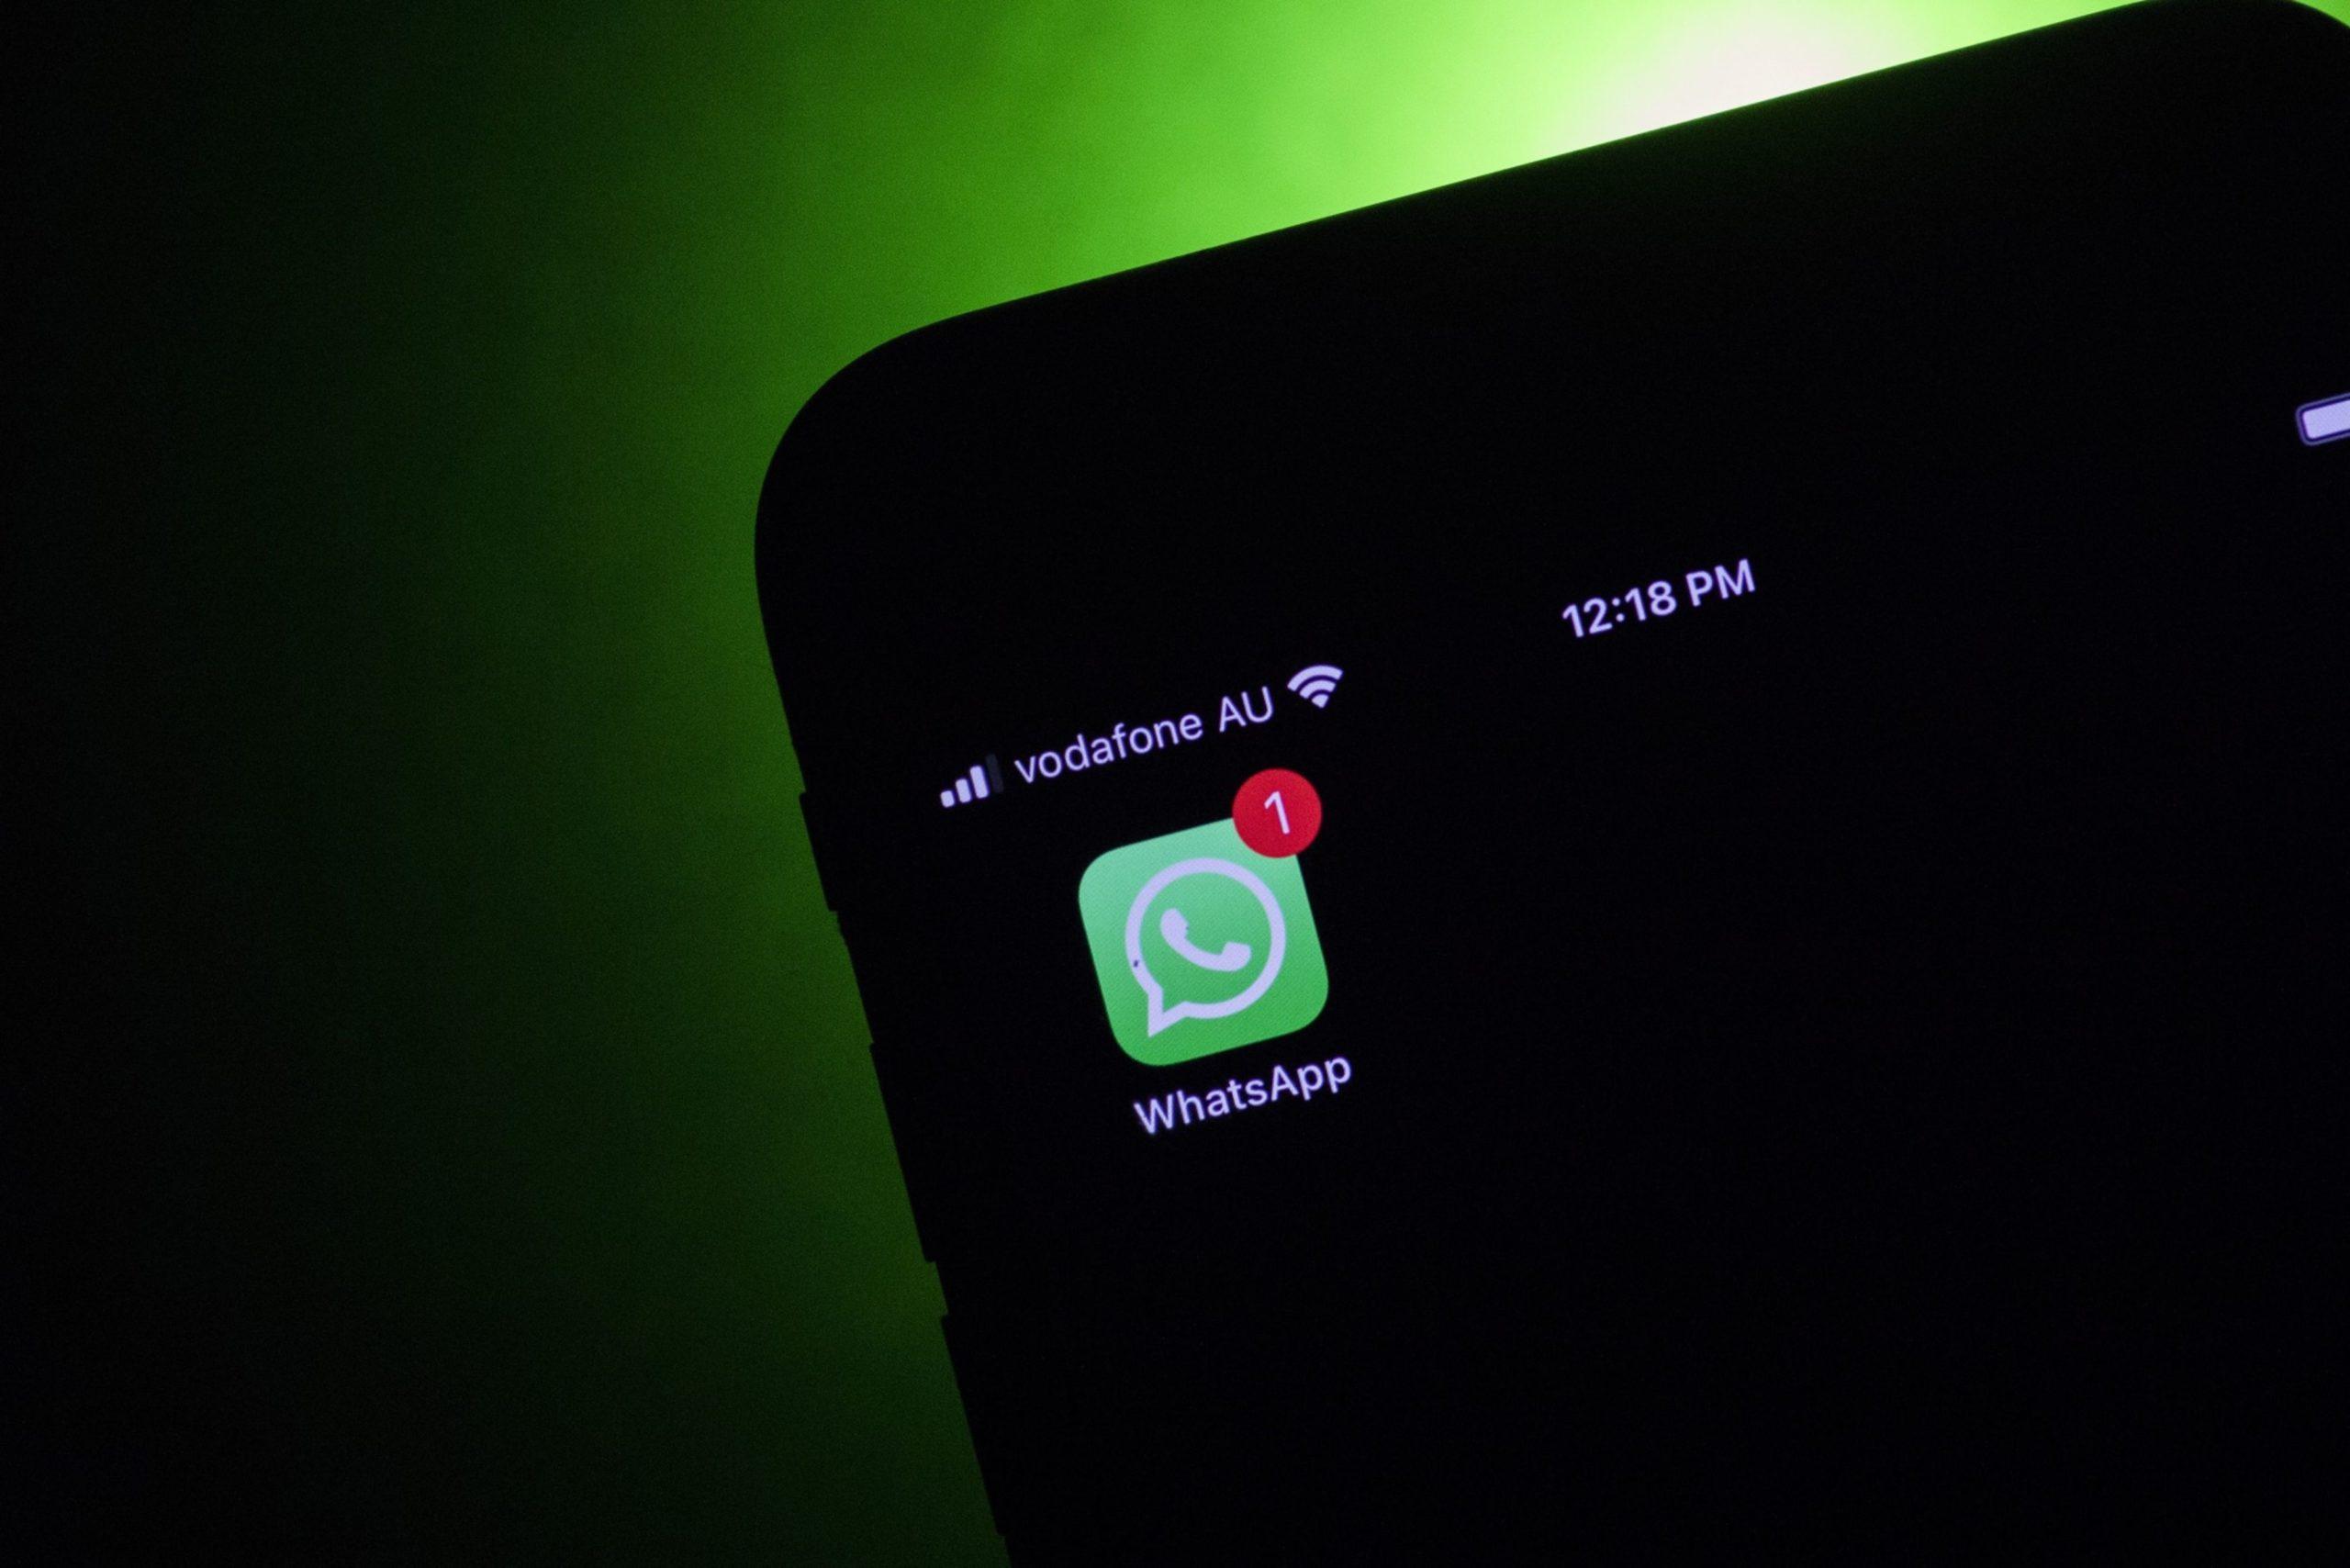 UK Data Watchdog Says Millions Have Stopped Using WhatsApp - Daily Maverick